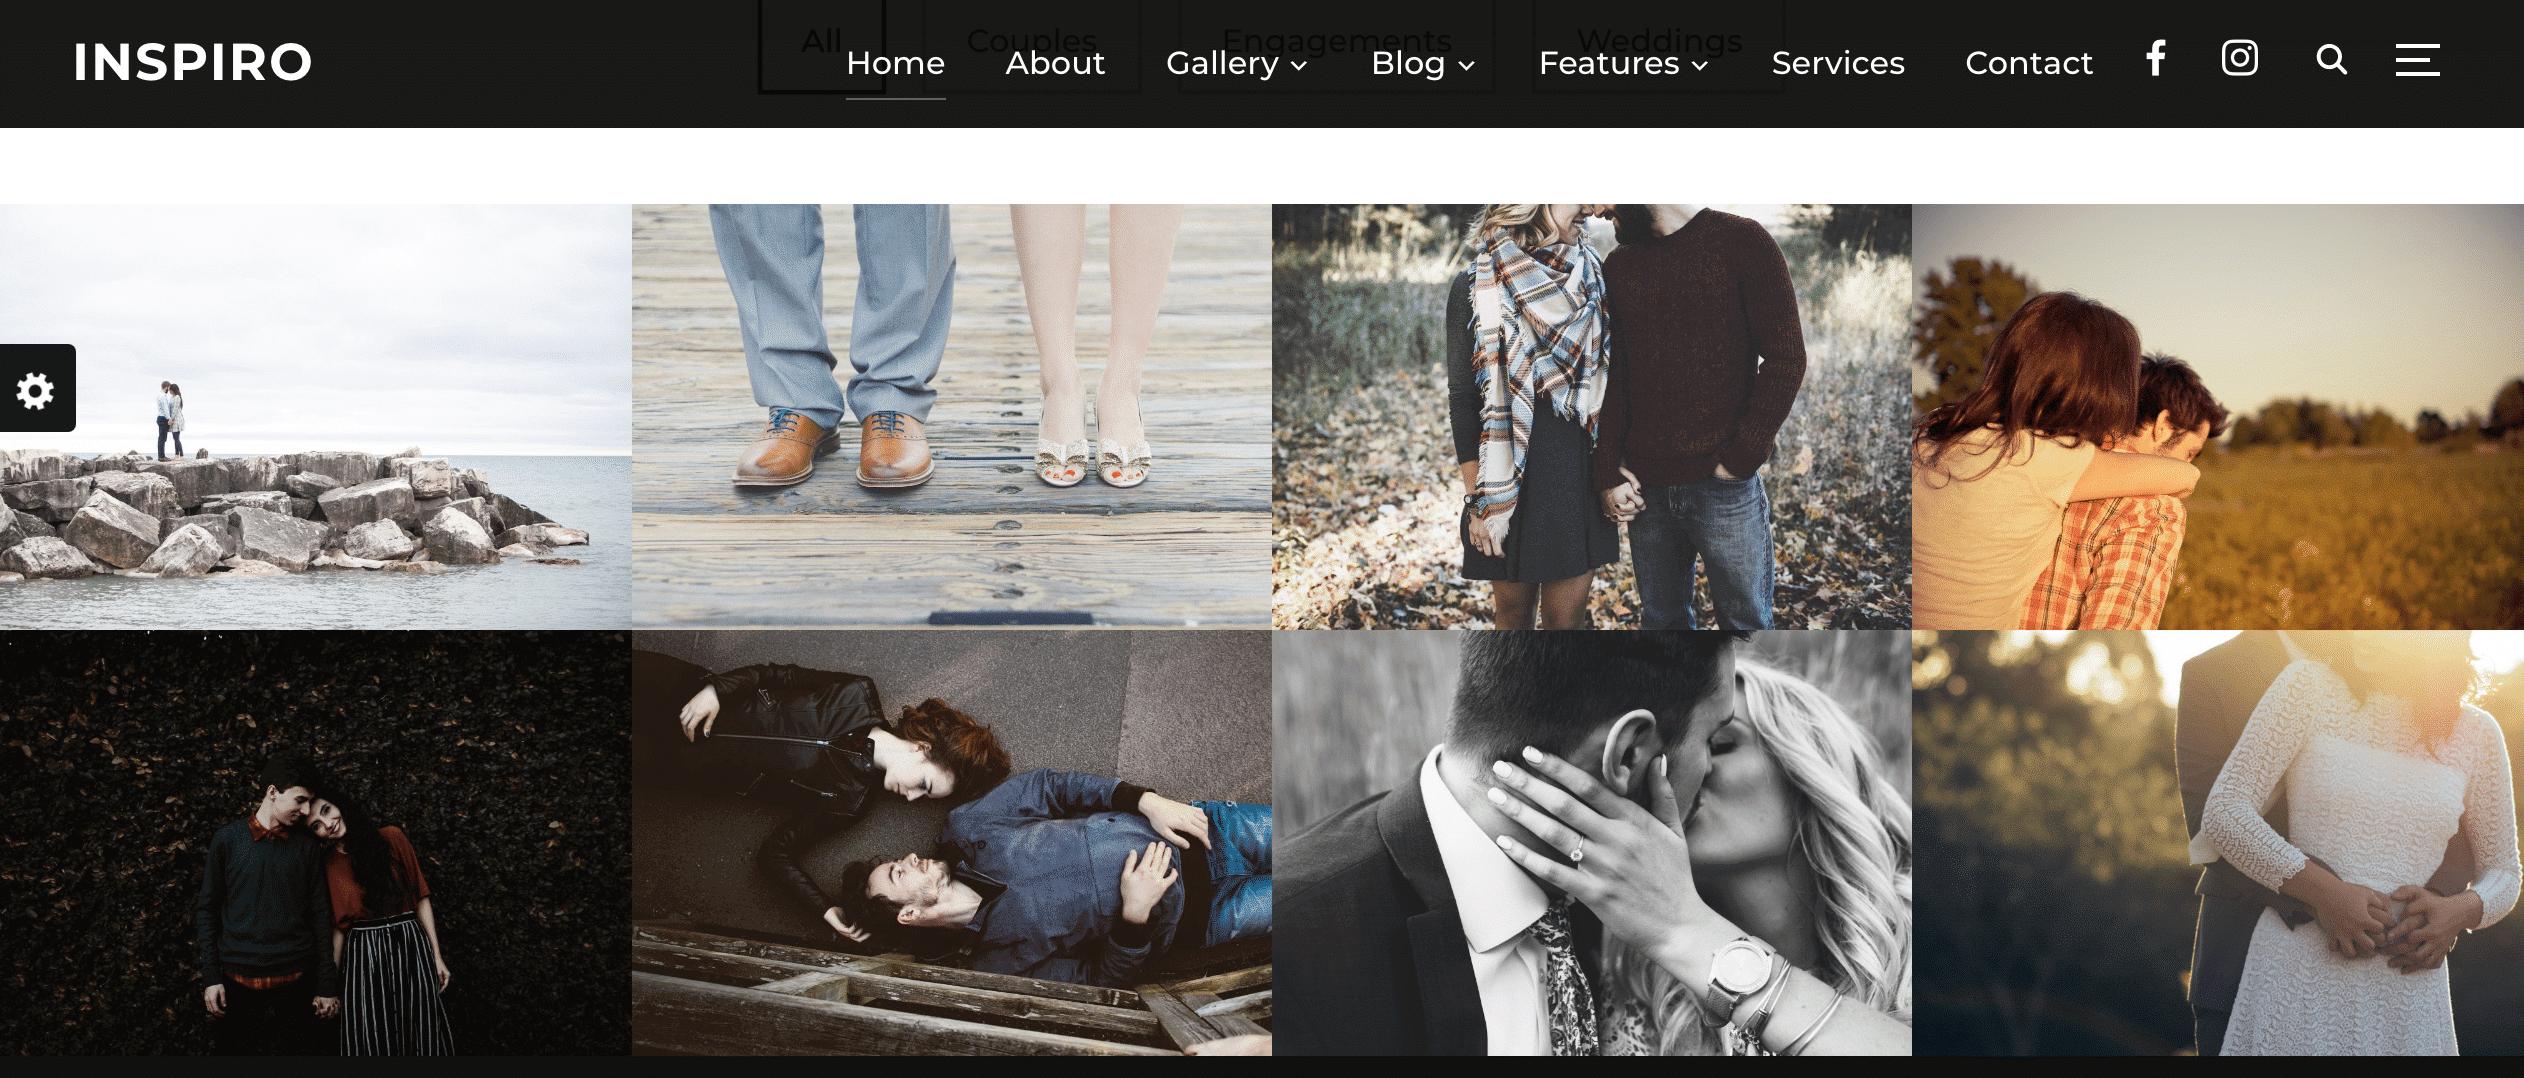 Inspiro WordPress grid theme